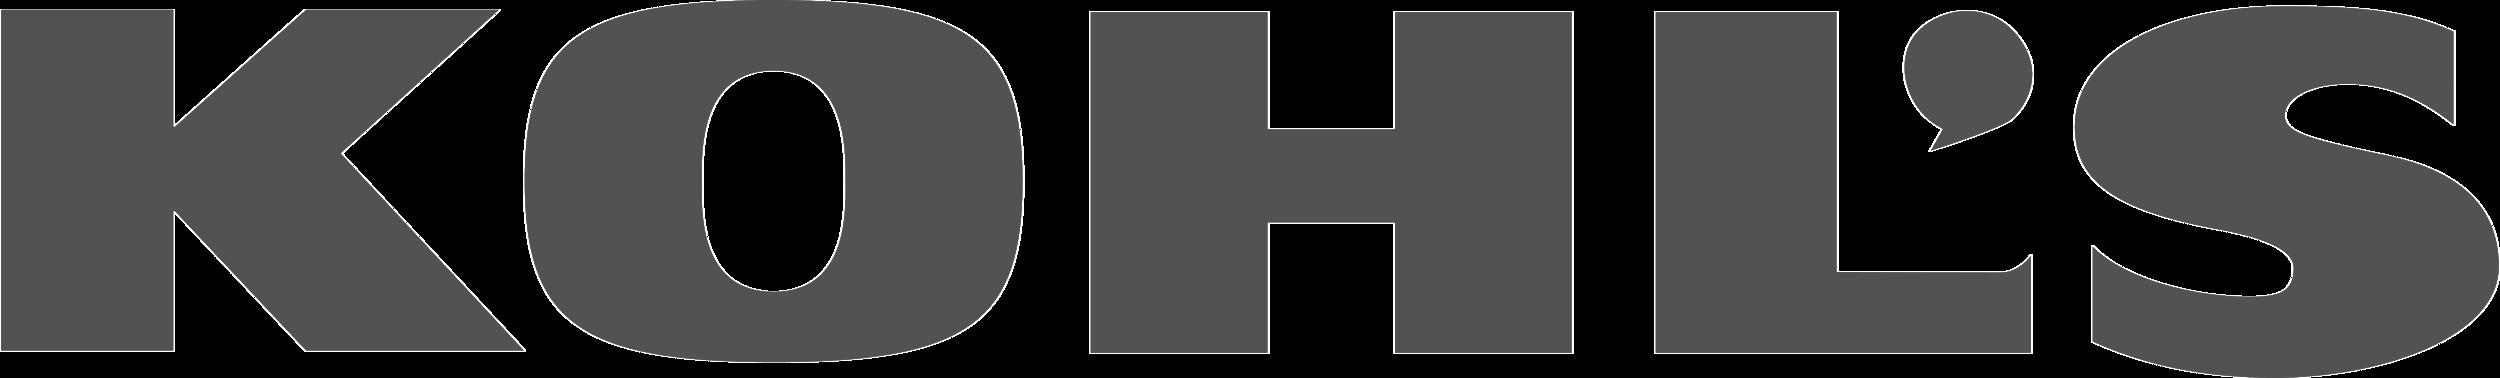 Kohls_logo_gray.png